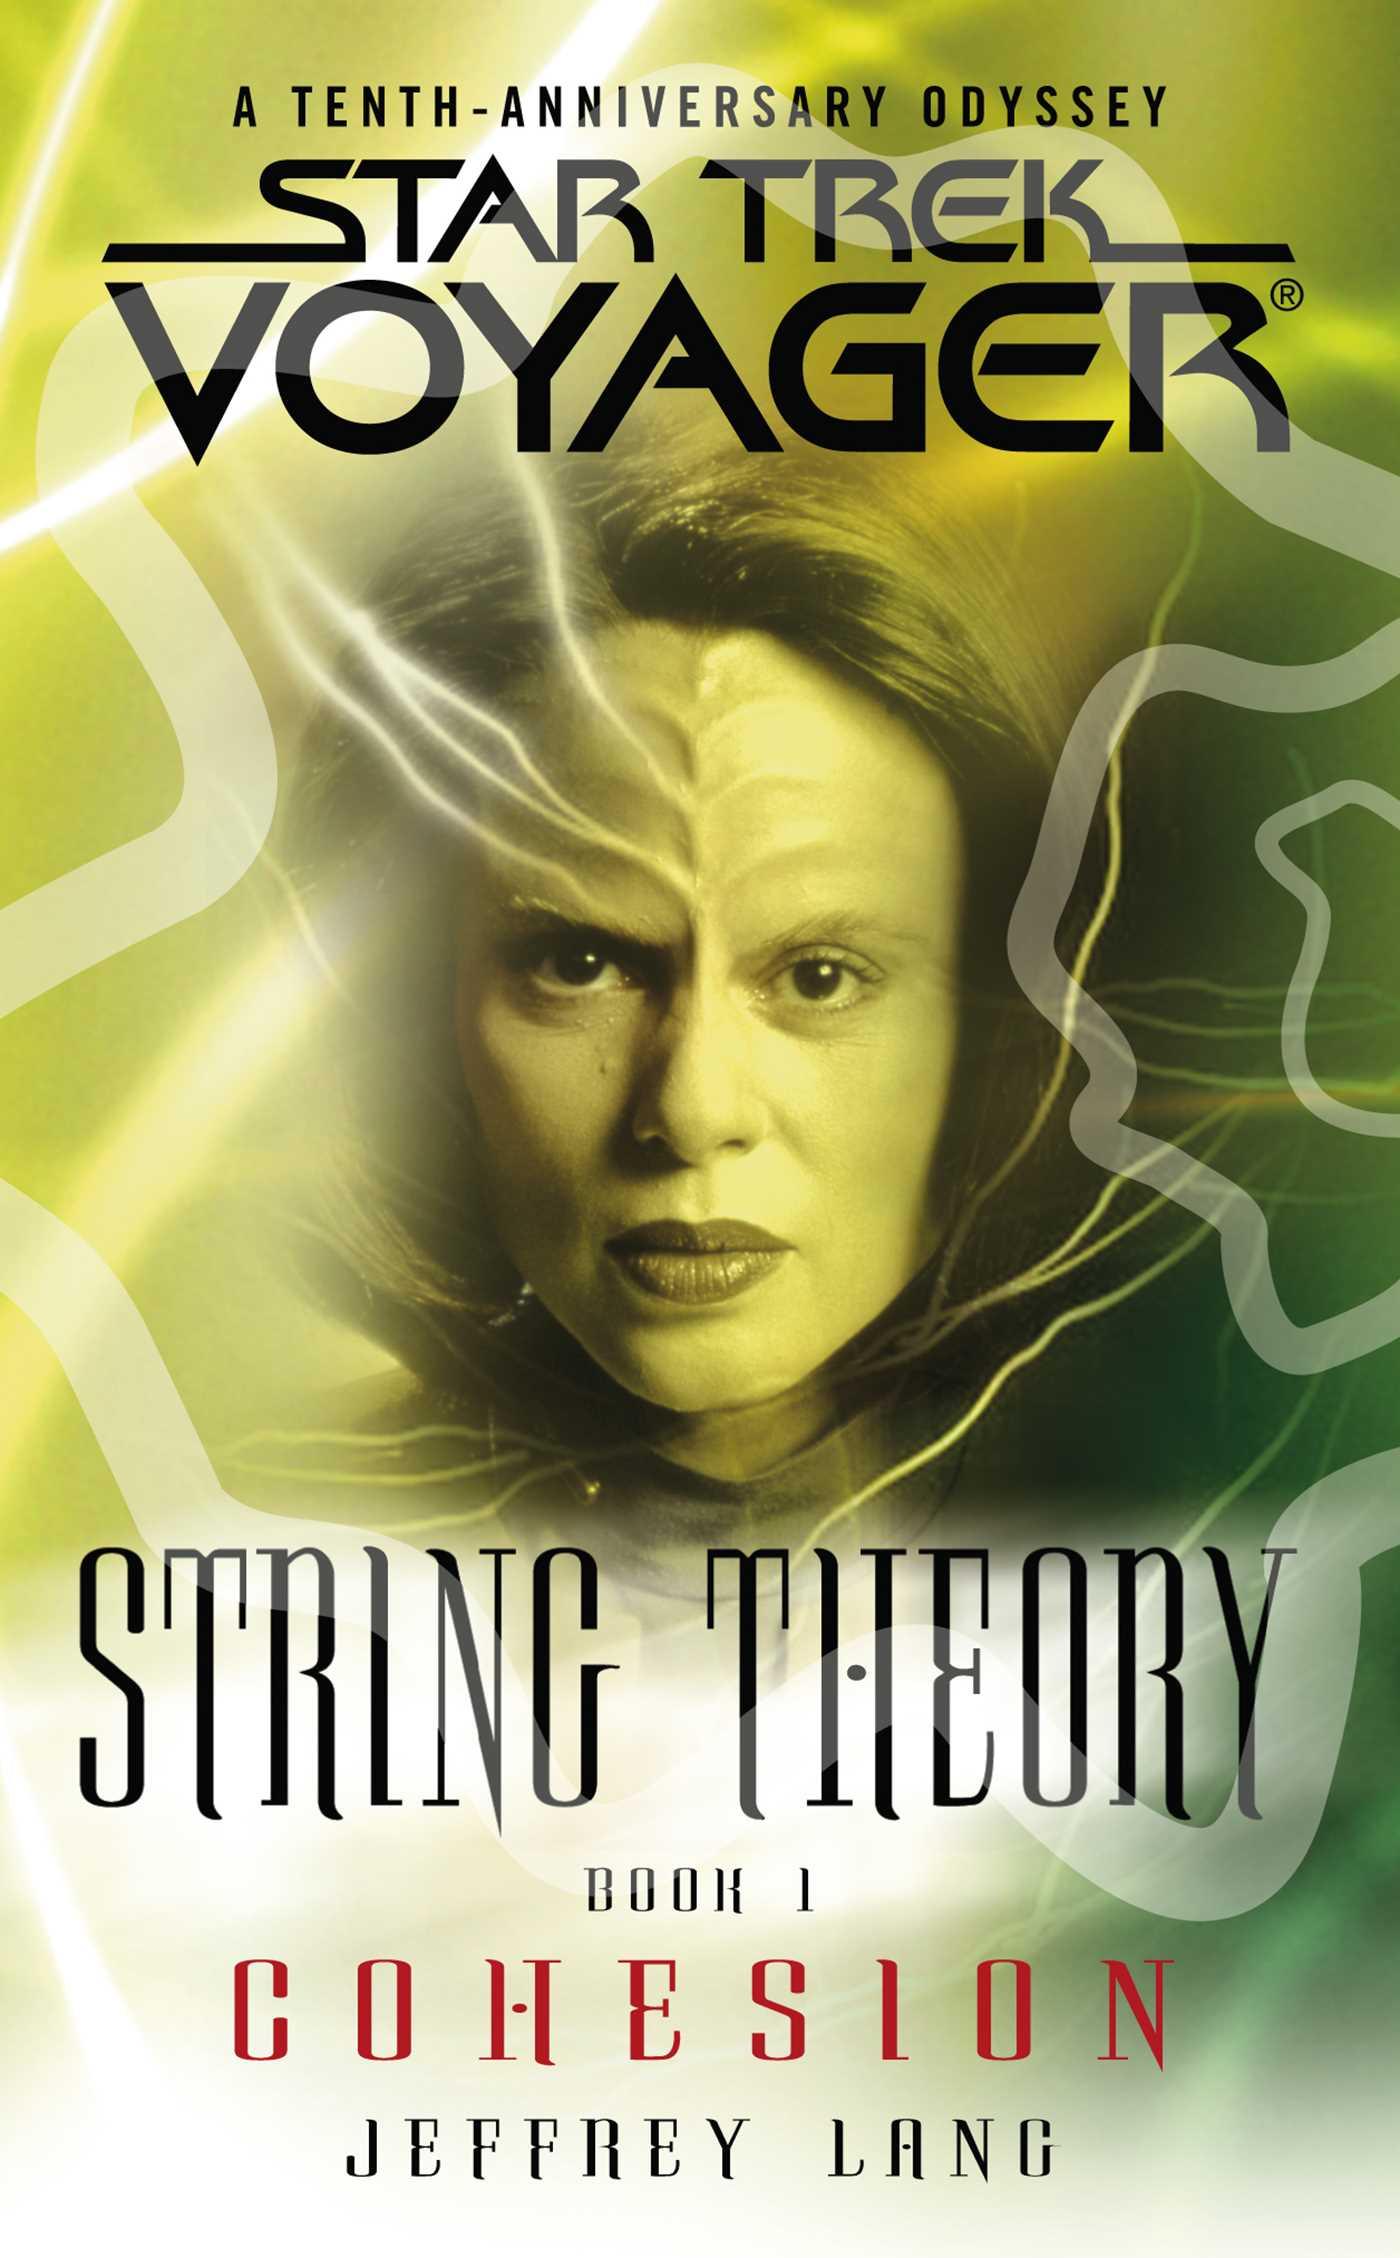 Star trek voyager string theory 1 cohesion 9781416510314 hr